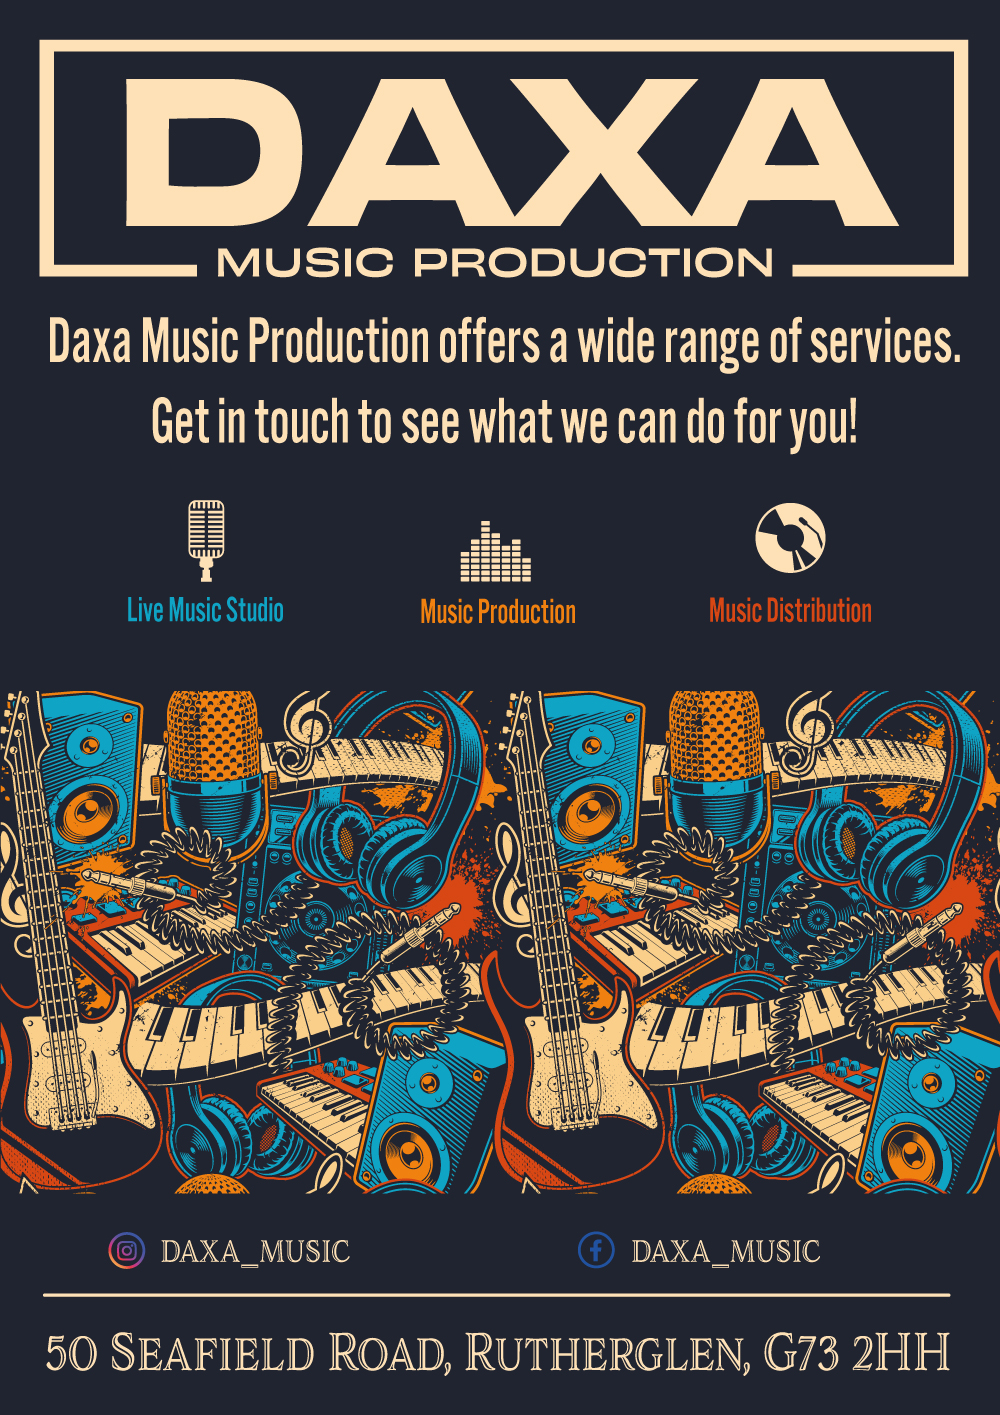 Daxa-Music-Production